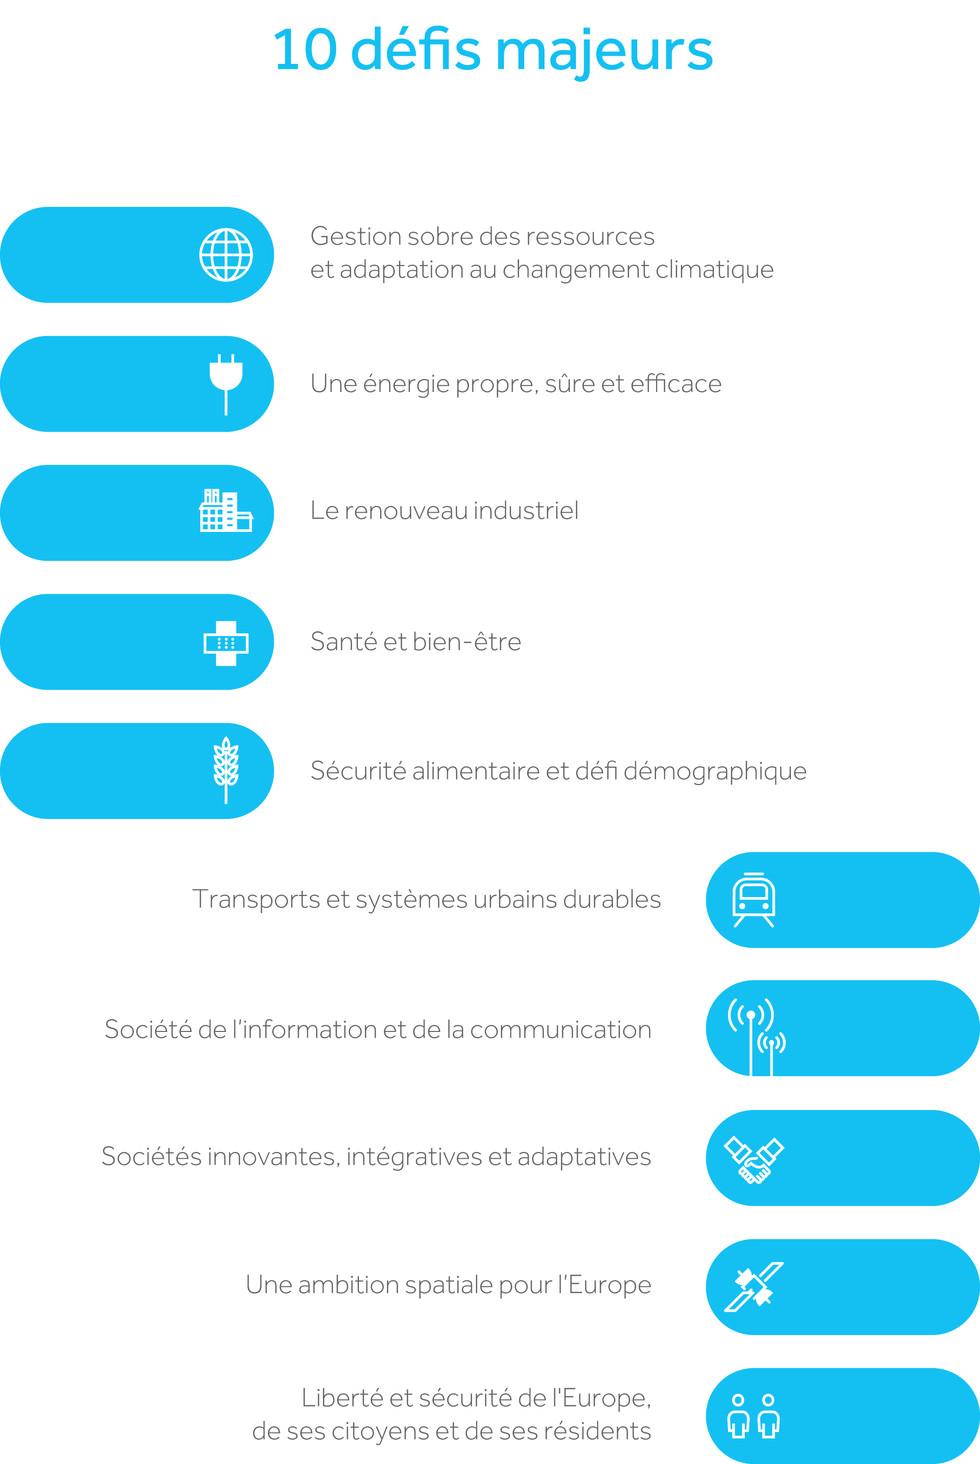 SNR : 10 défis majeurs